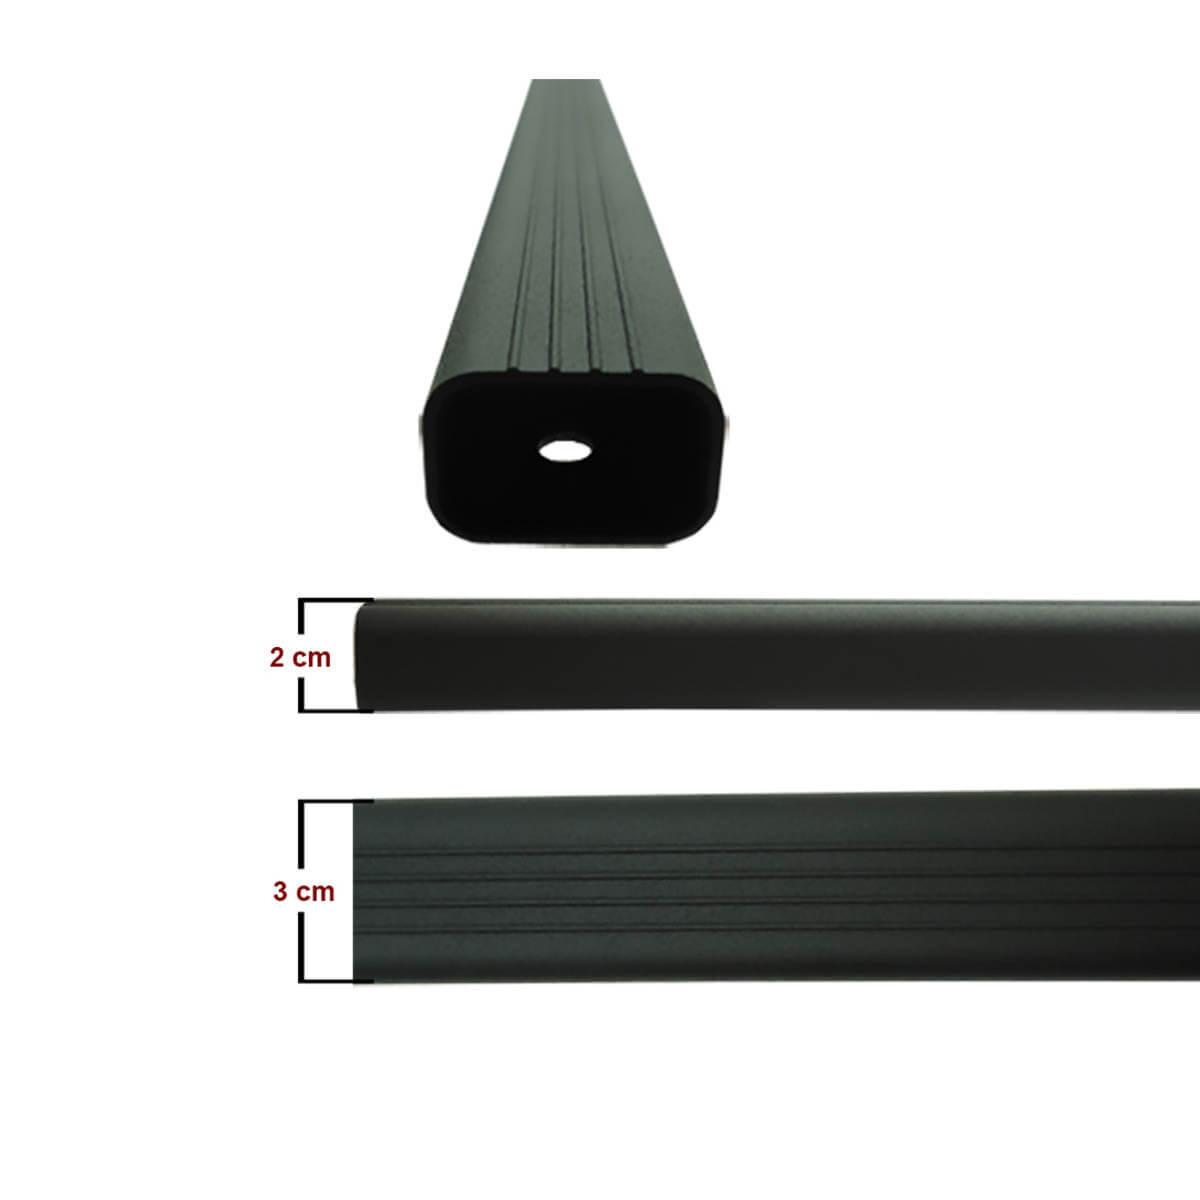 Travessa rack de teto alumínio preta Spacefox 2006 a 2019 ou Space Cross 2012 a 2018 kit 3 peças